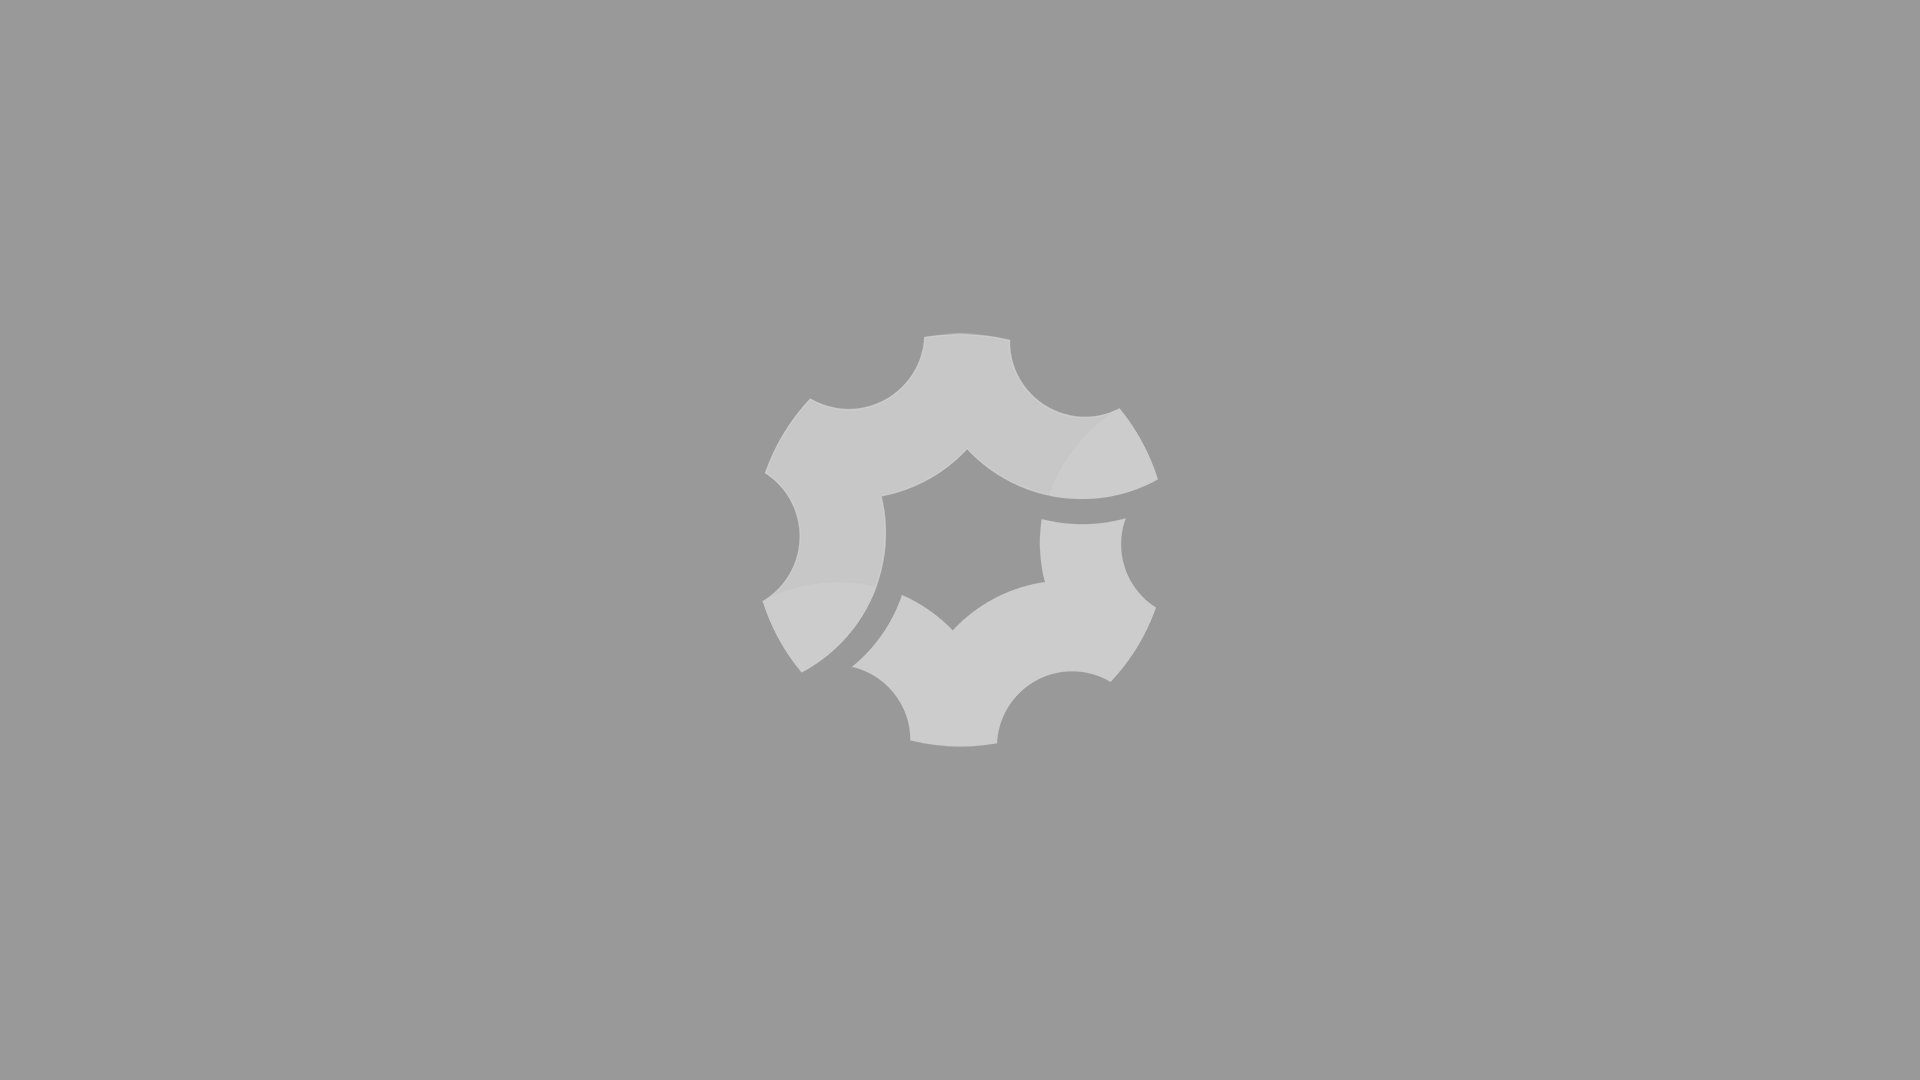 snowrunner_screenshot_2021.01.11_-_02.08.58.86.png